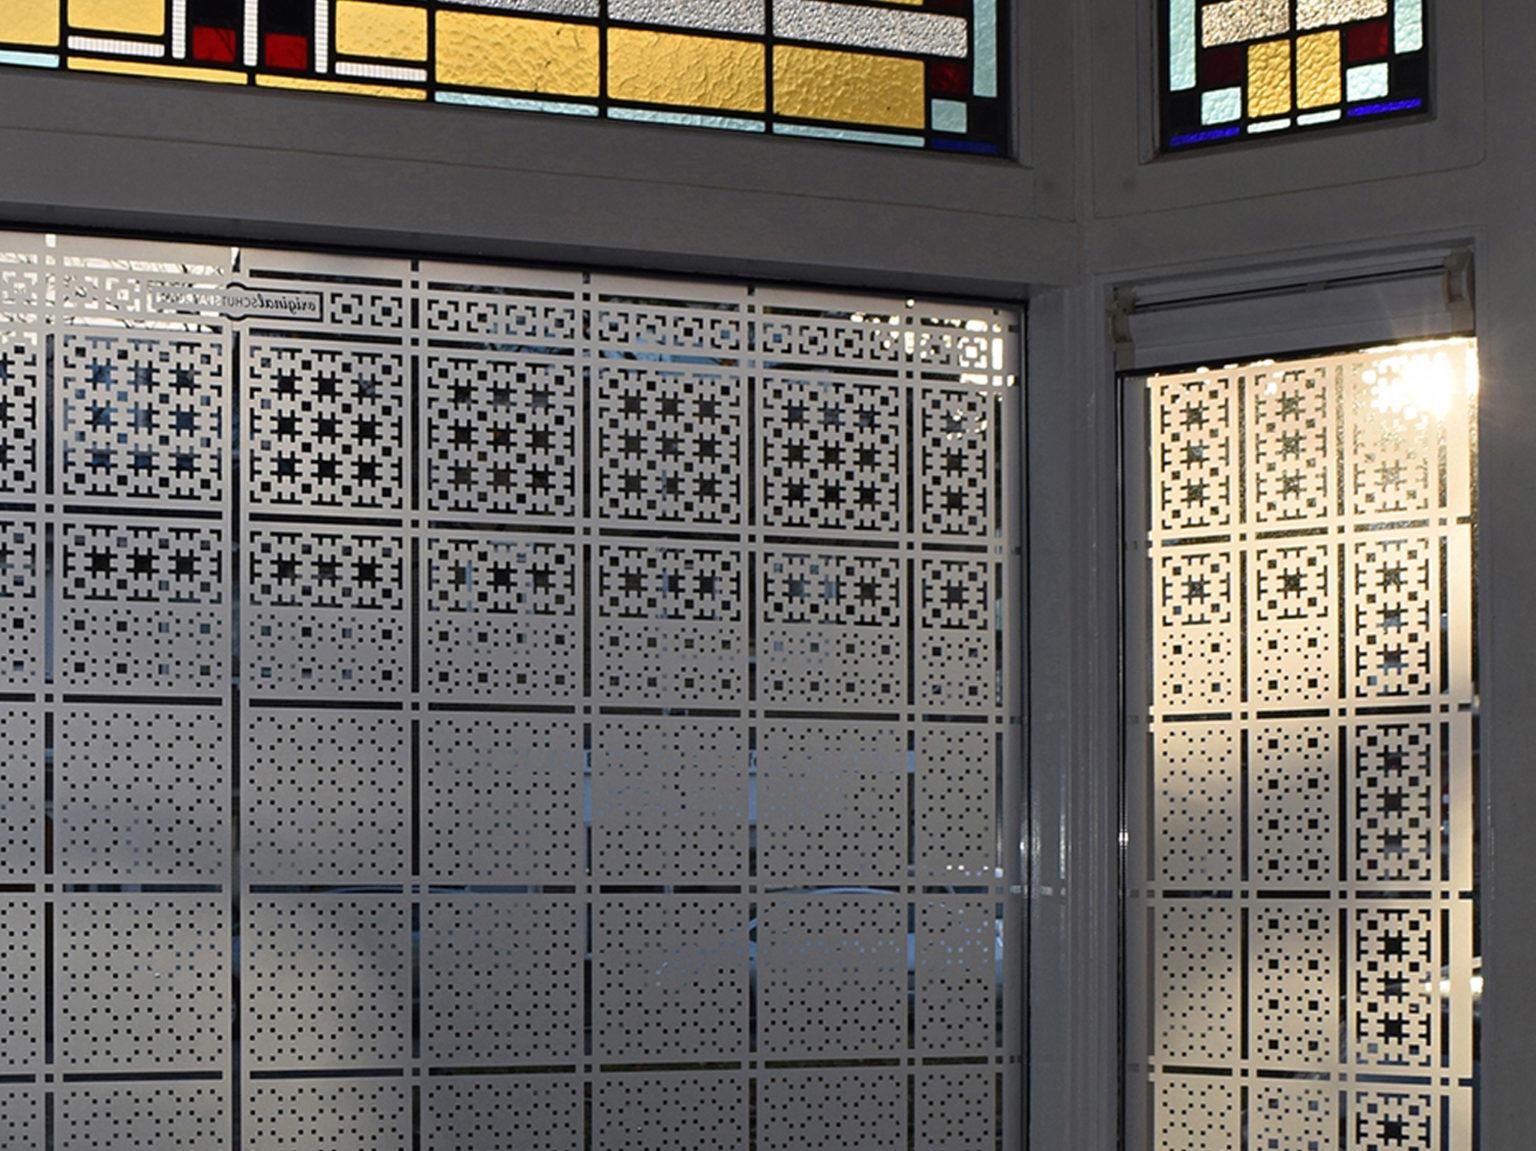 raamfolie patroon/Schutspatroon op keukenraam van binnenuit gezien 2